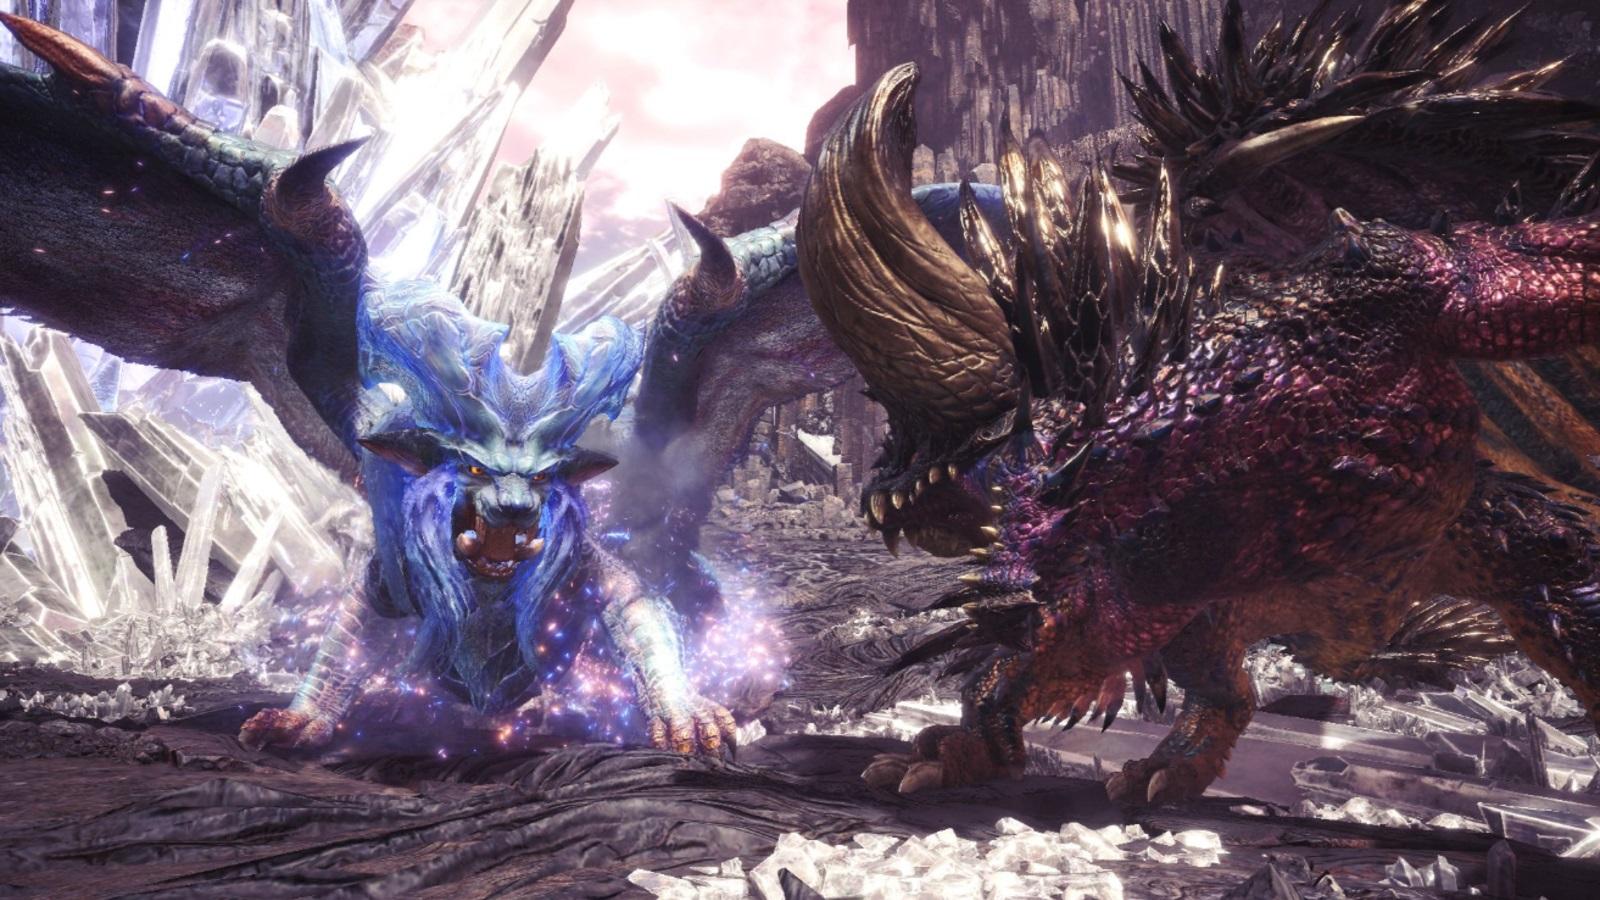 Monster Hunter: World's PC players get burned by Lunastra on November 22 screenshot